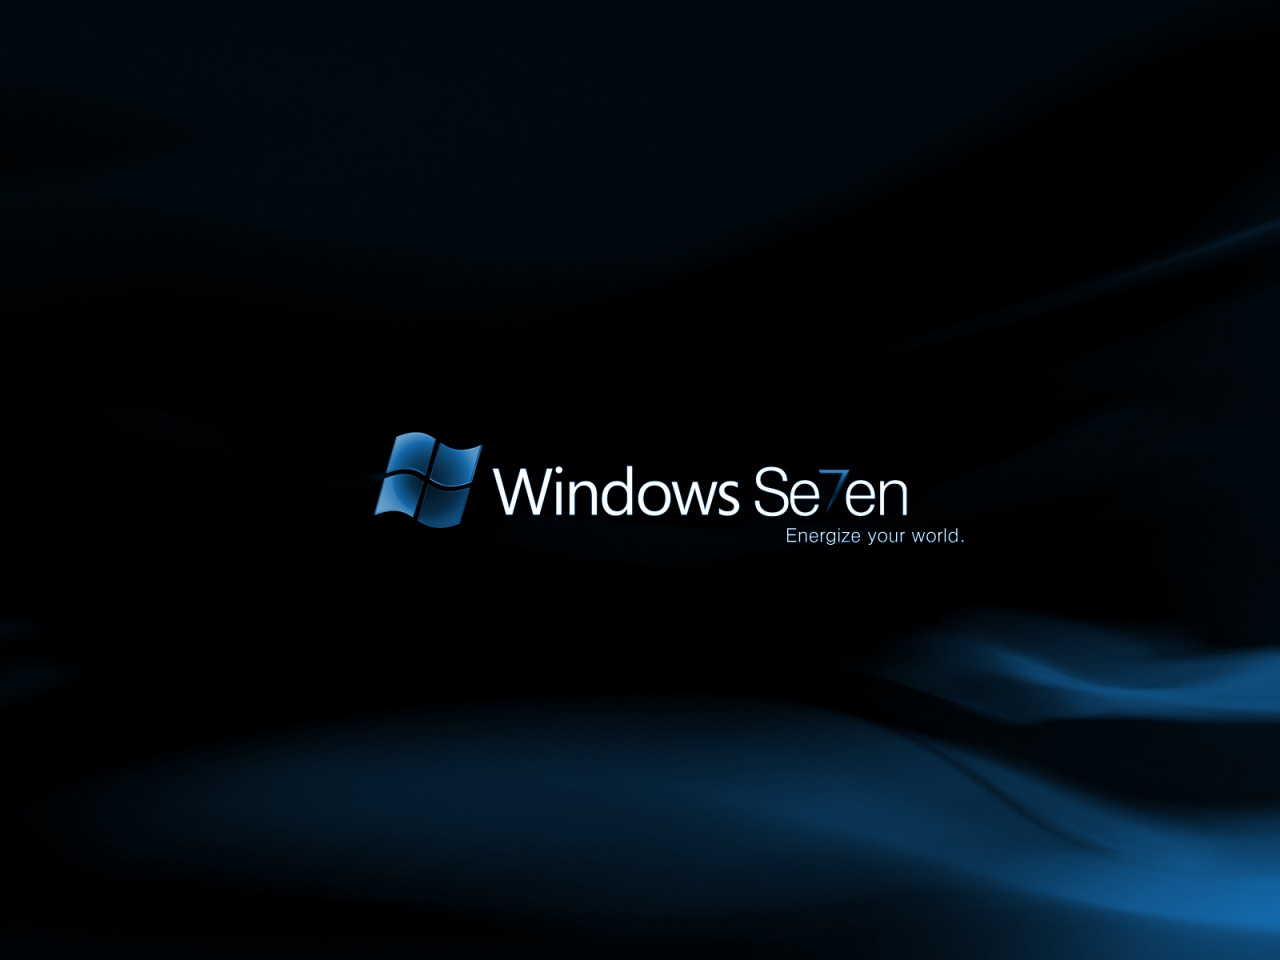 http://3.bp.blogspot.com/-yvauMdYX_8s/TnBoOTIQktI/AAAAAAAAATY/WiwJO05_XM0/s1600/Windows7-Wallpaper.jpg